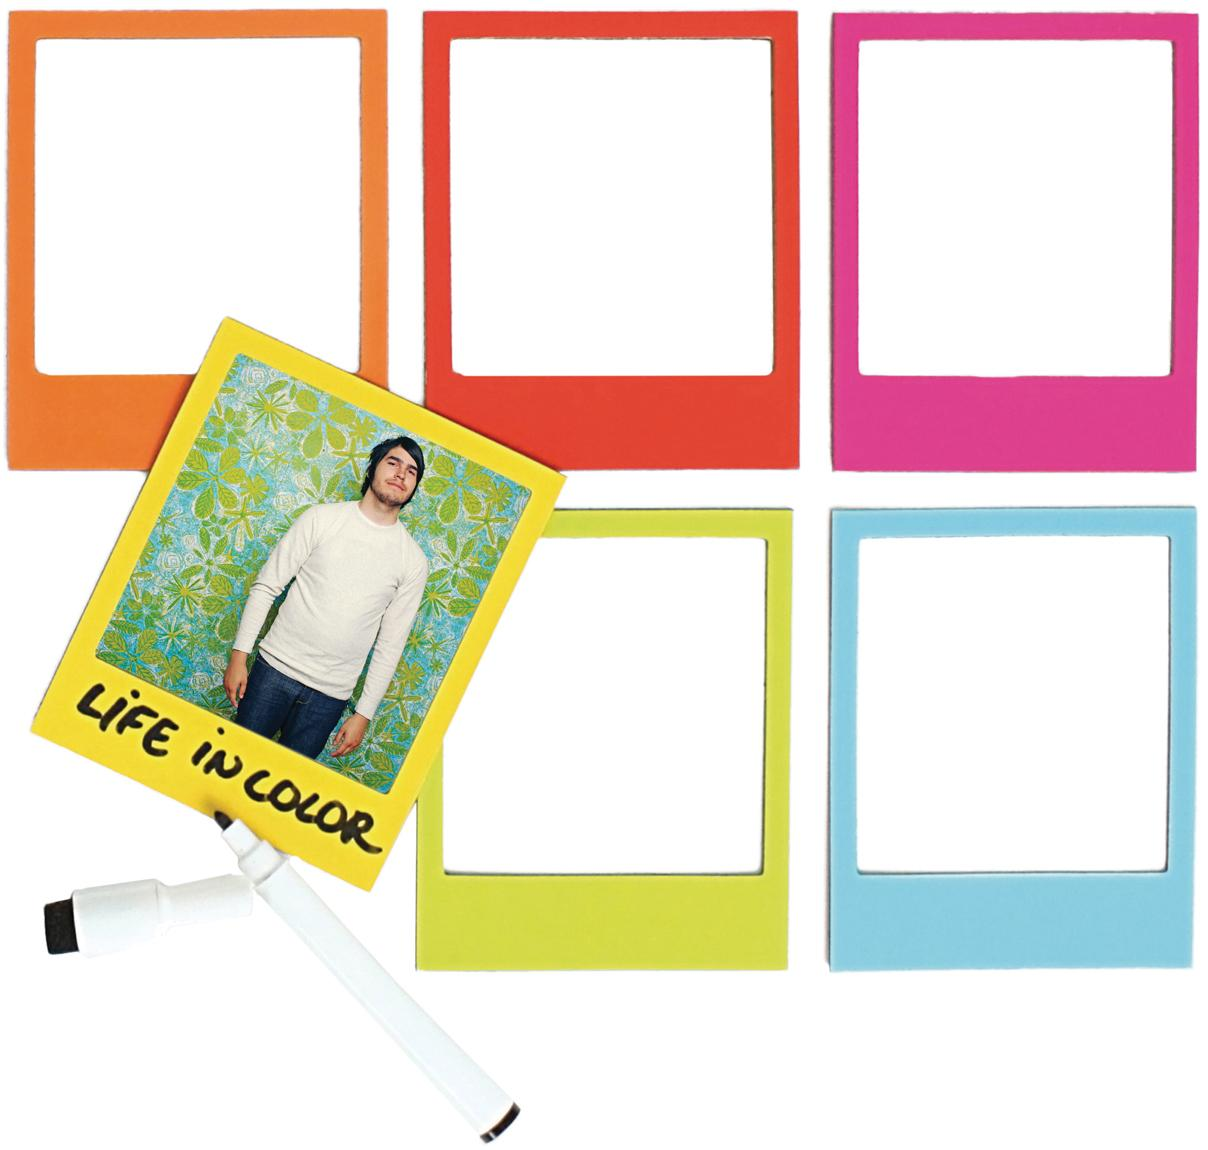 Bilderrahmen-Set Rainbow, 6-tlg., Vorderseite: PVC, Rückseite: Magnet, Mehrfarbig, 6 x 9 cm